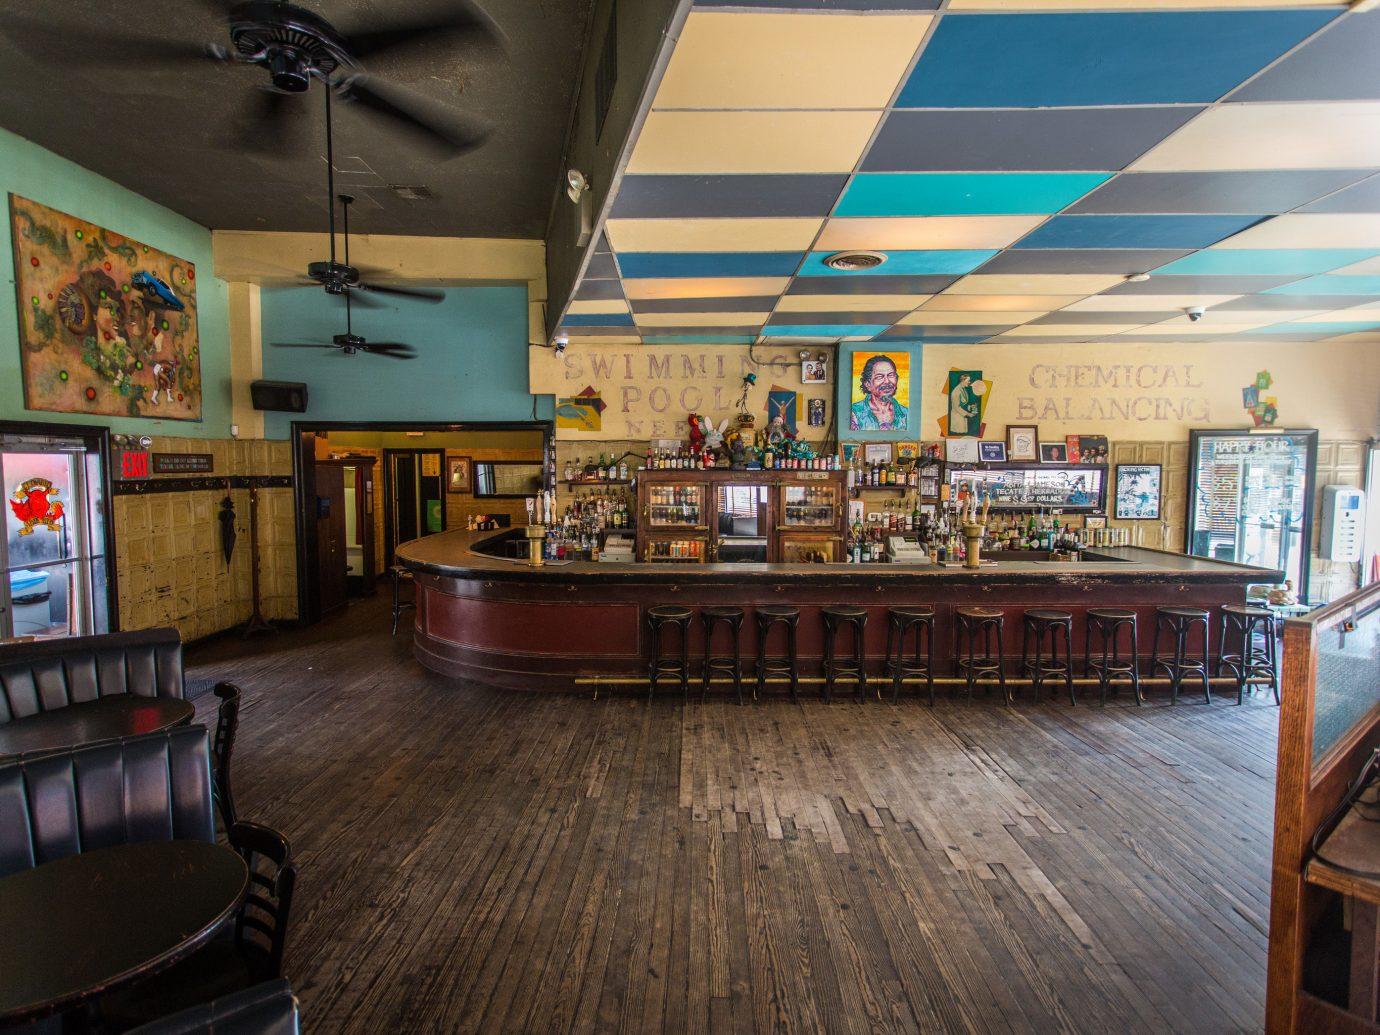 City Trip Ideas Weekend Getaways indoor floor ceiling interior design flooring restaurant table area furniture